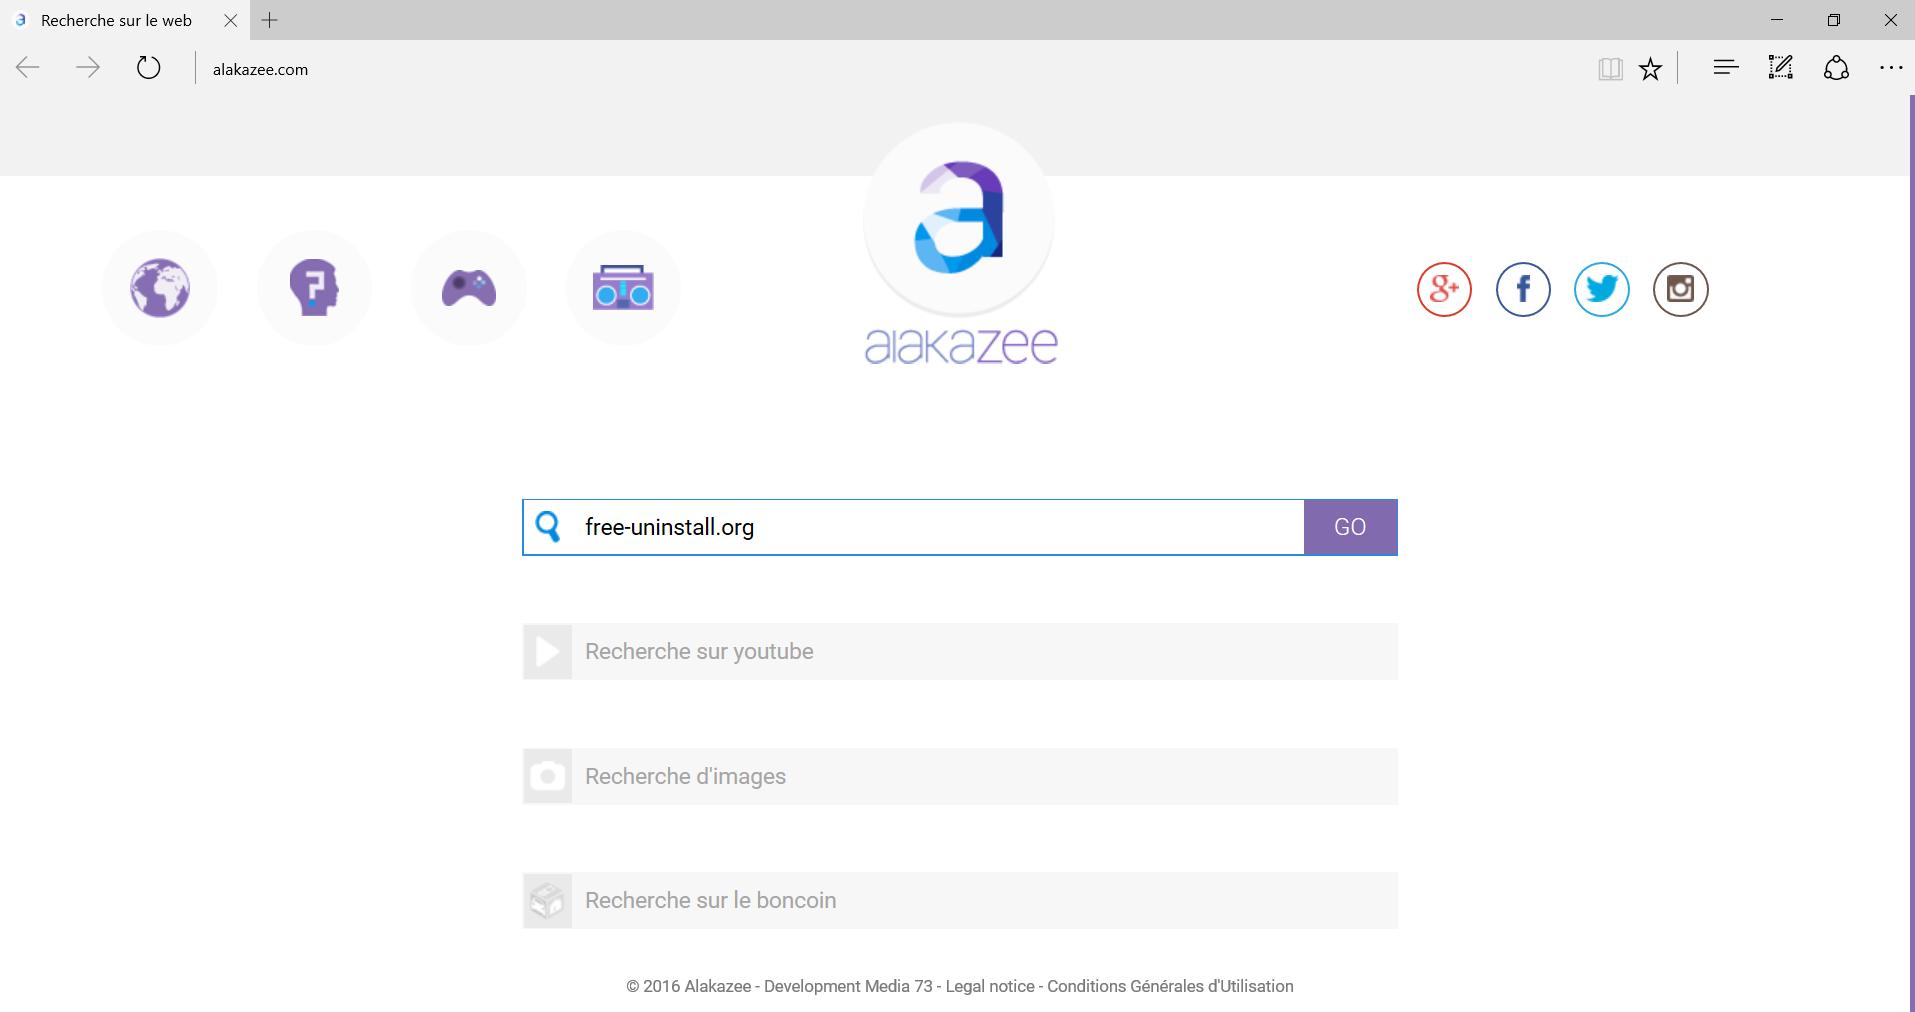 Alakazee.com Hijacker